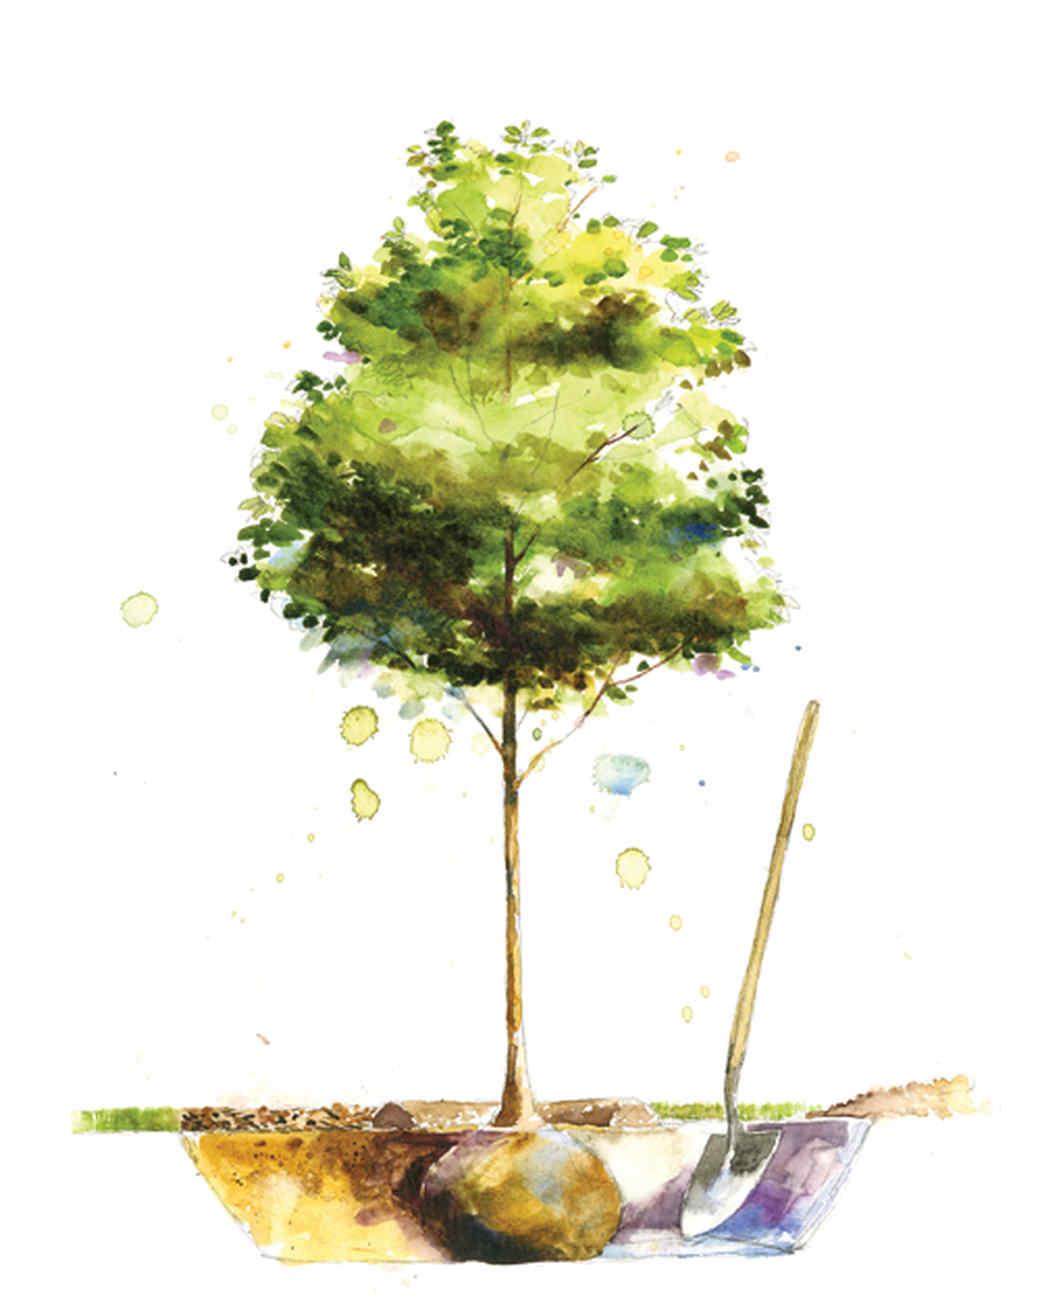 mla105636_0410_planttree.jpg